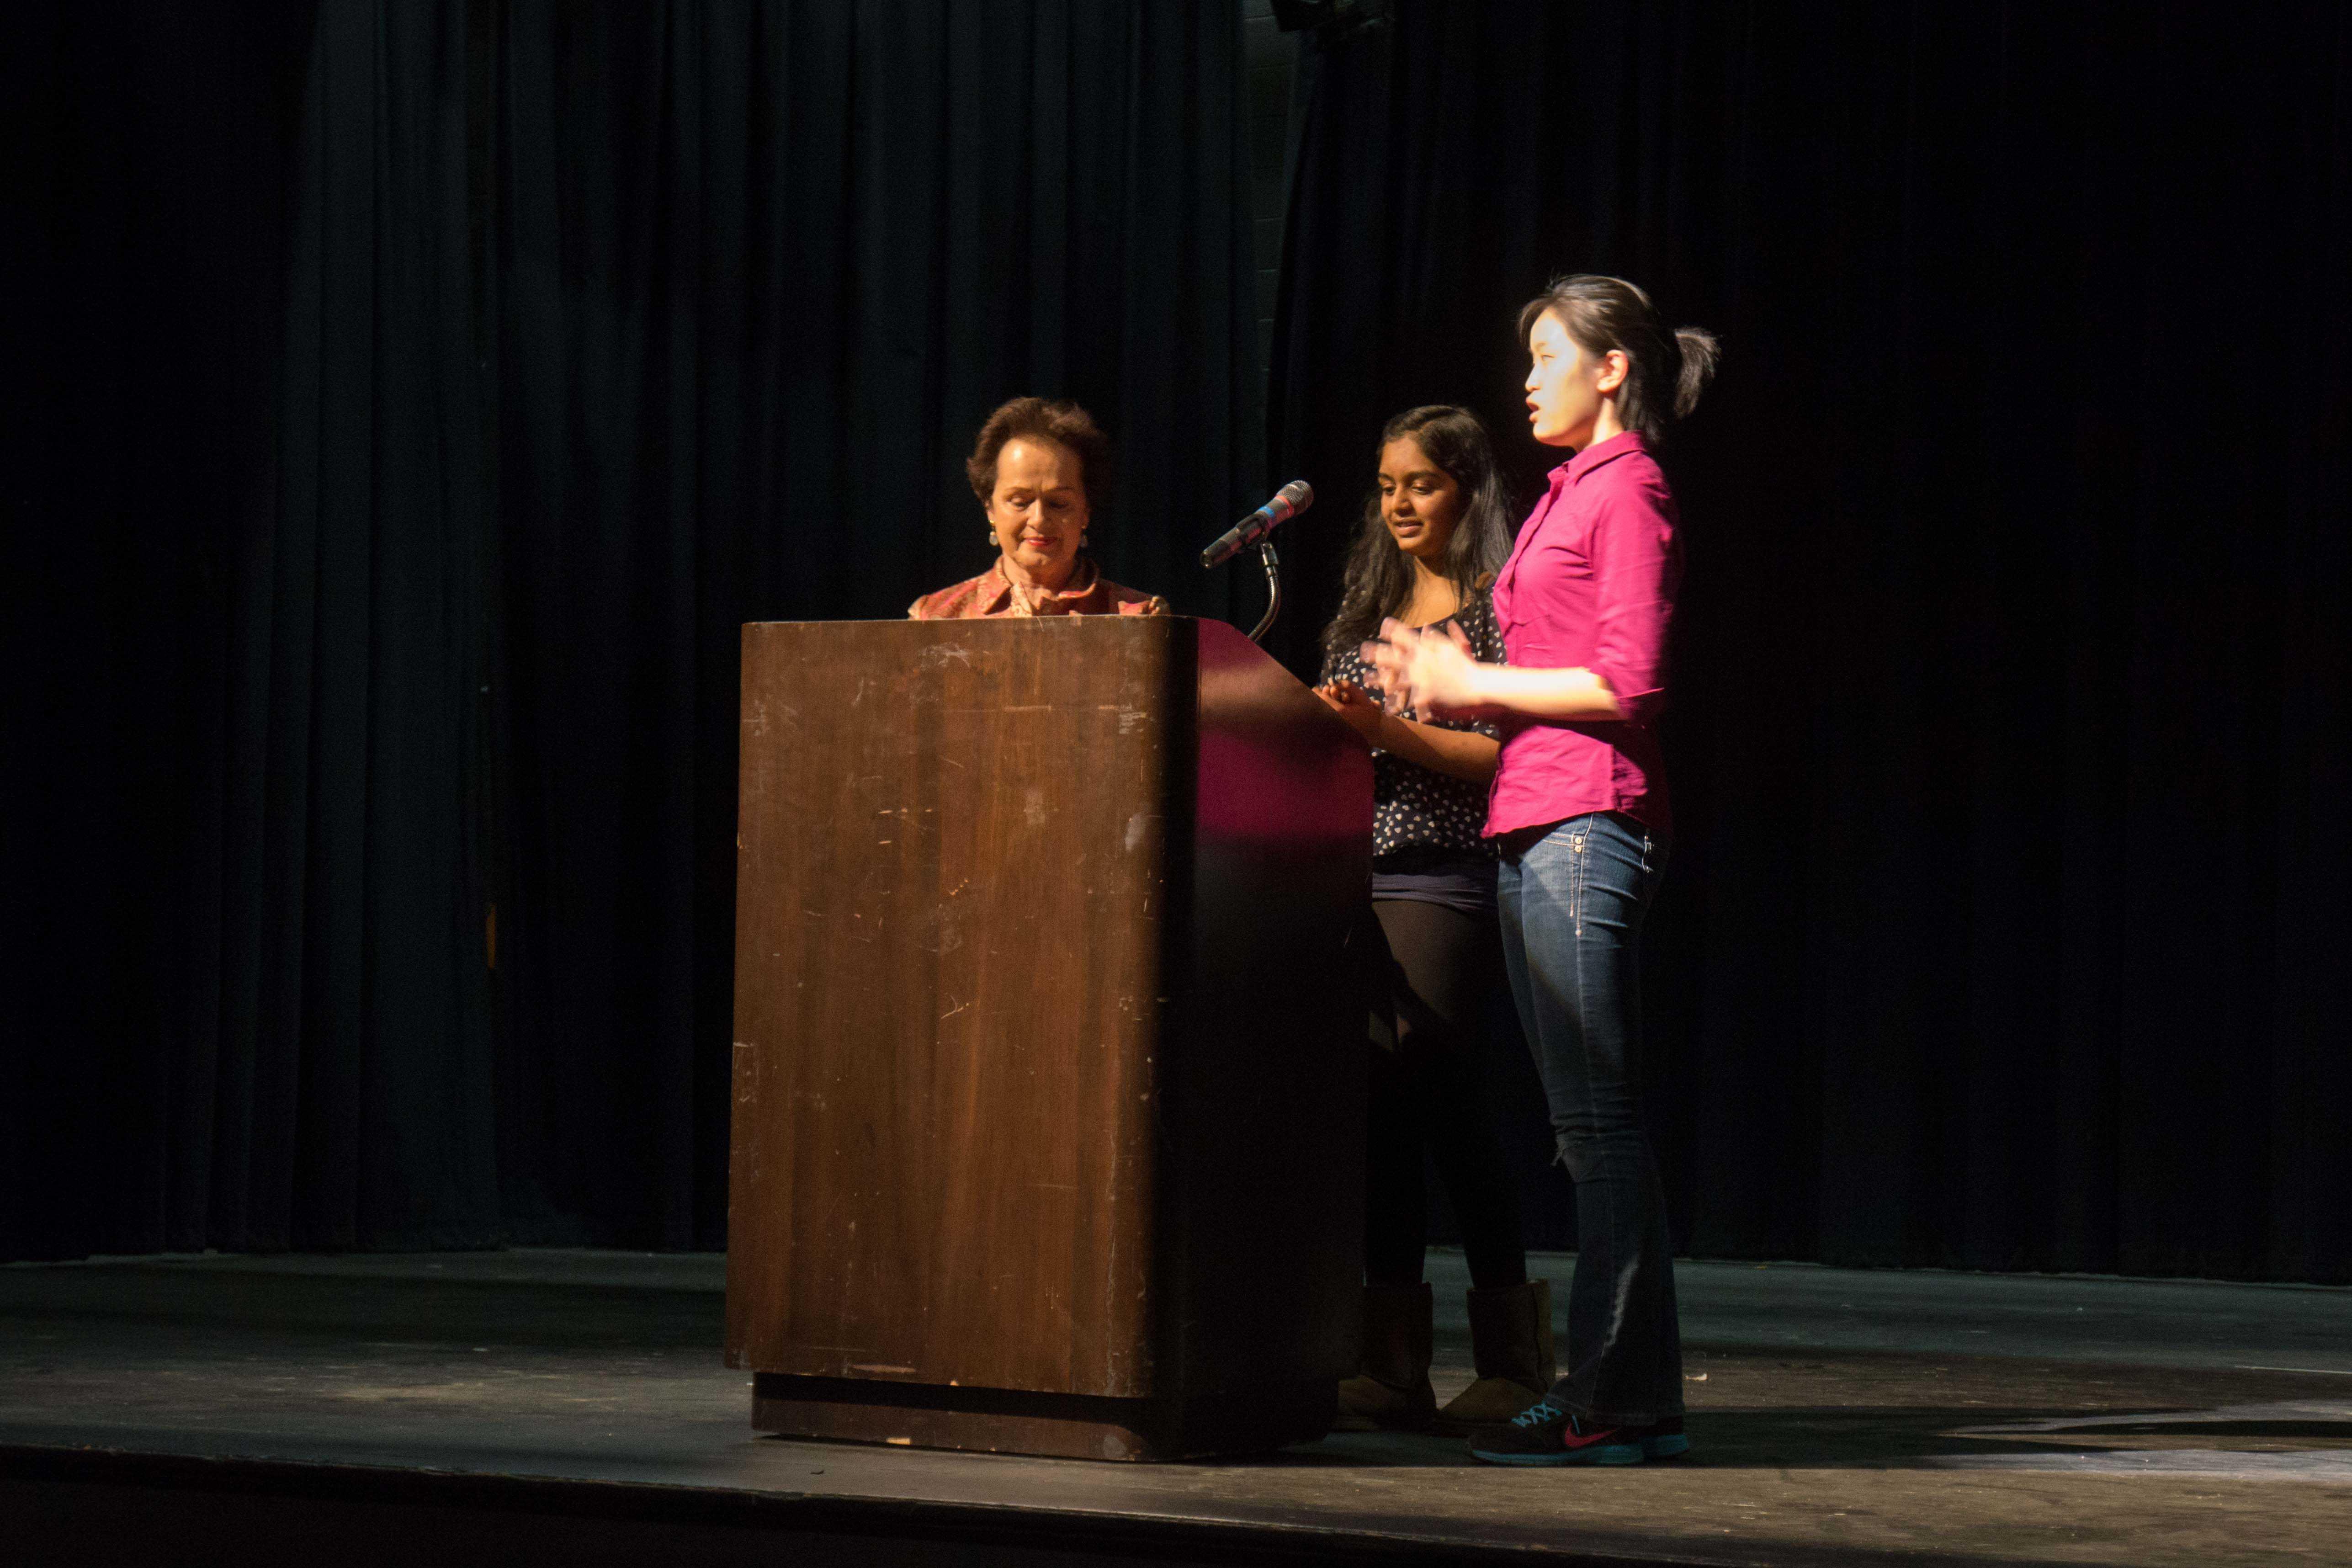 Freshman Niharika Vattikonda (center) and junior Wendy Wang (right) thank Ambassador Fritsche (left) for speaking at Jefferson.